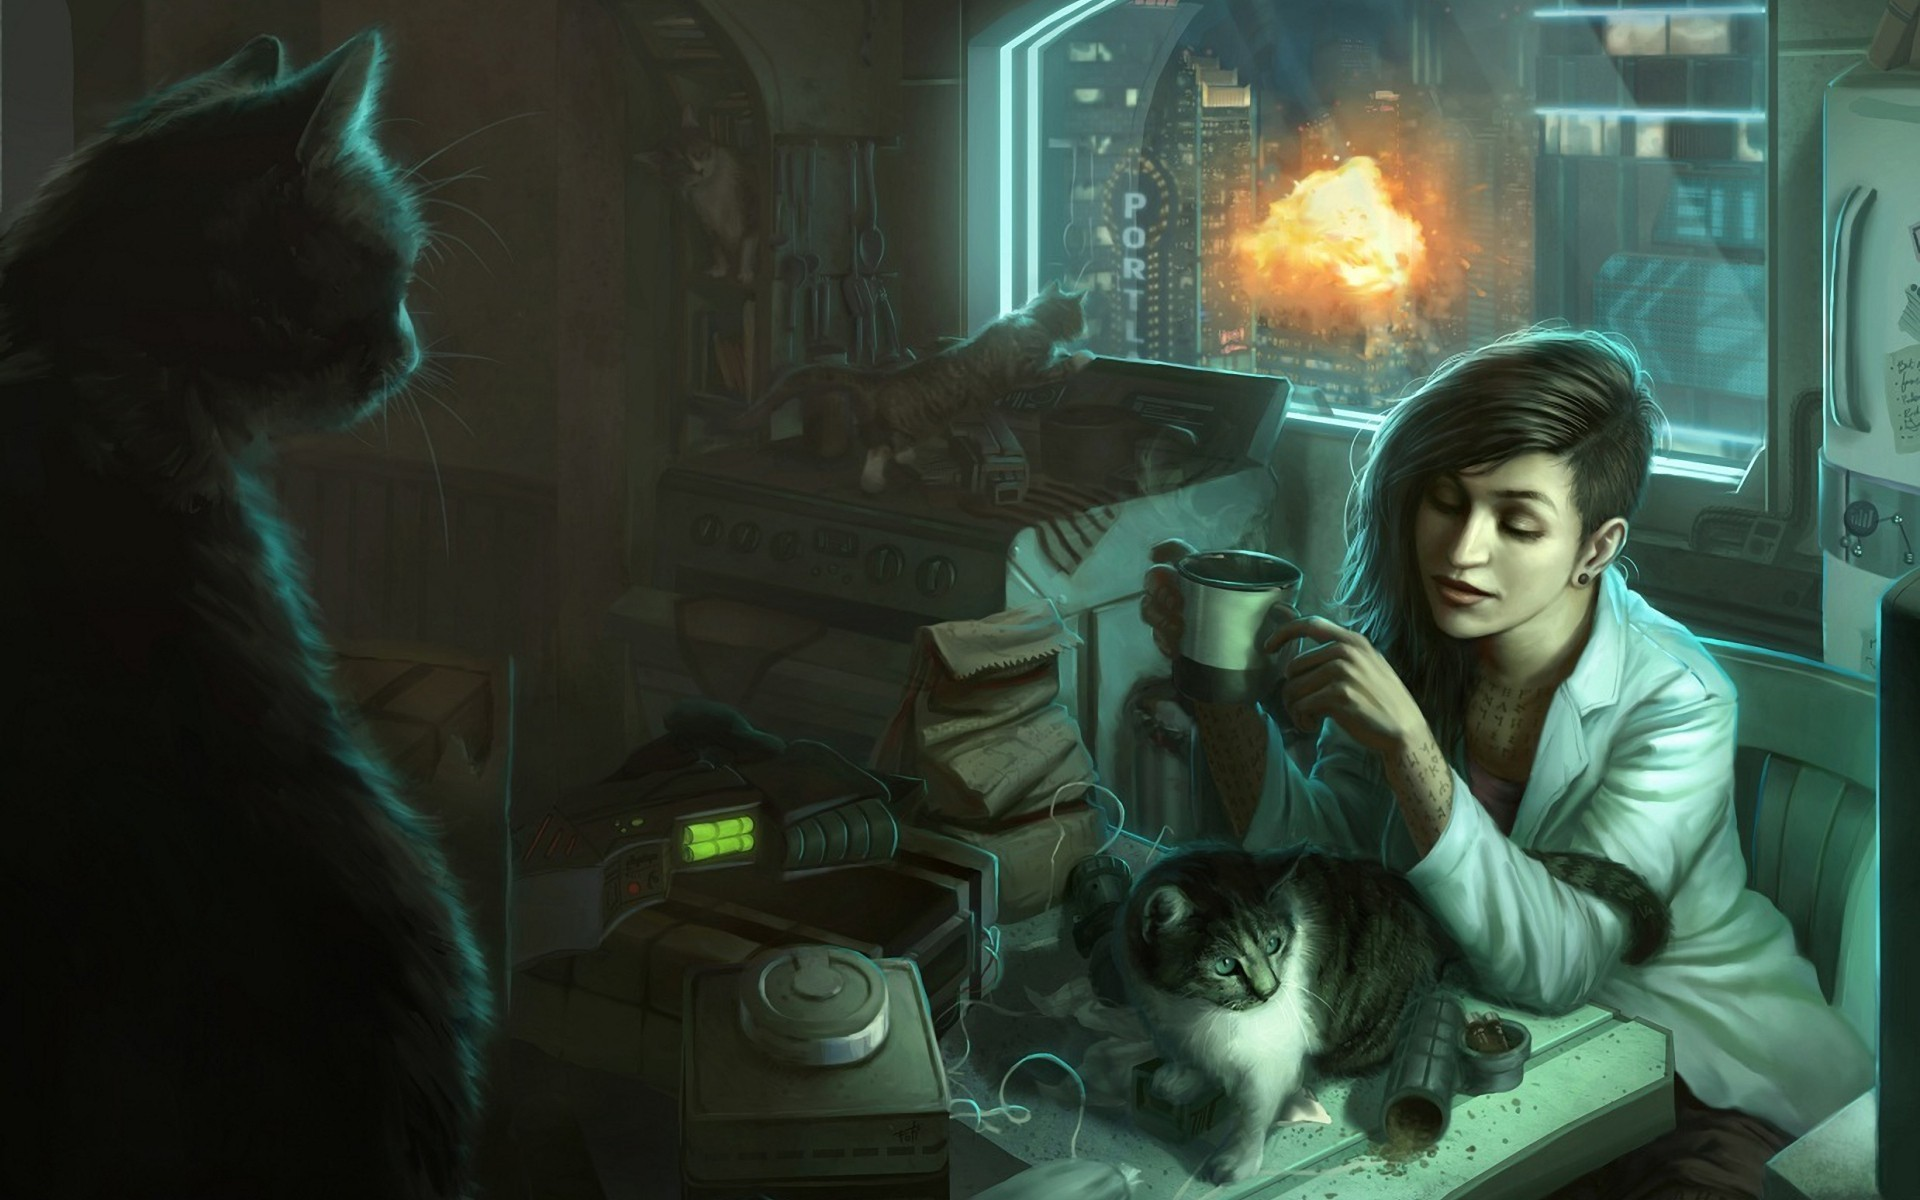 General 1920x1200 cats women artwork animals mammals indoors explosion brunette fire inked girls terrorist women indoors